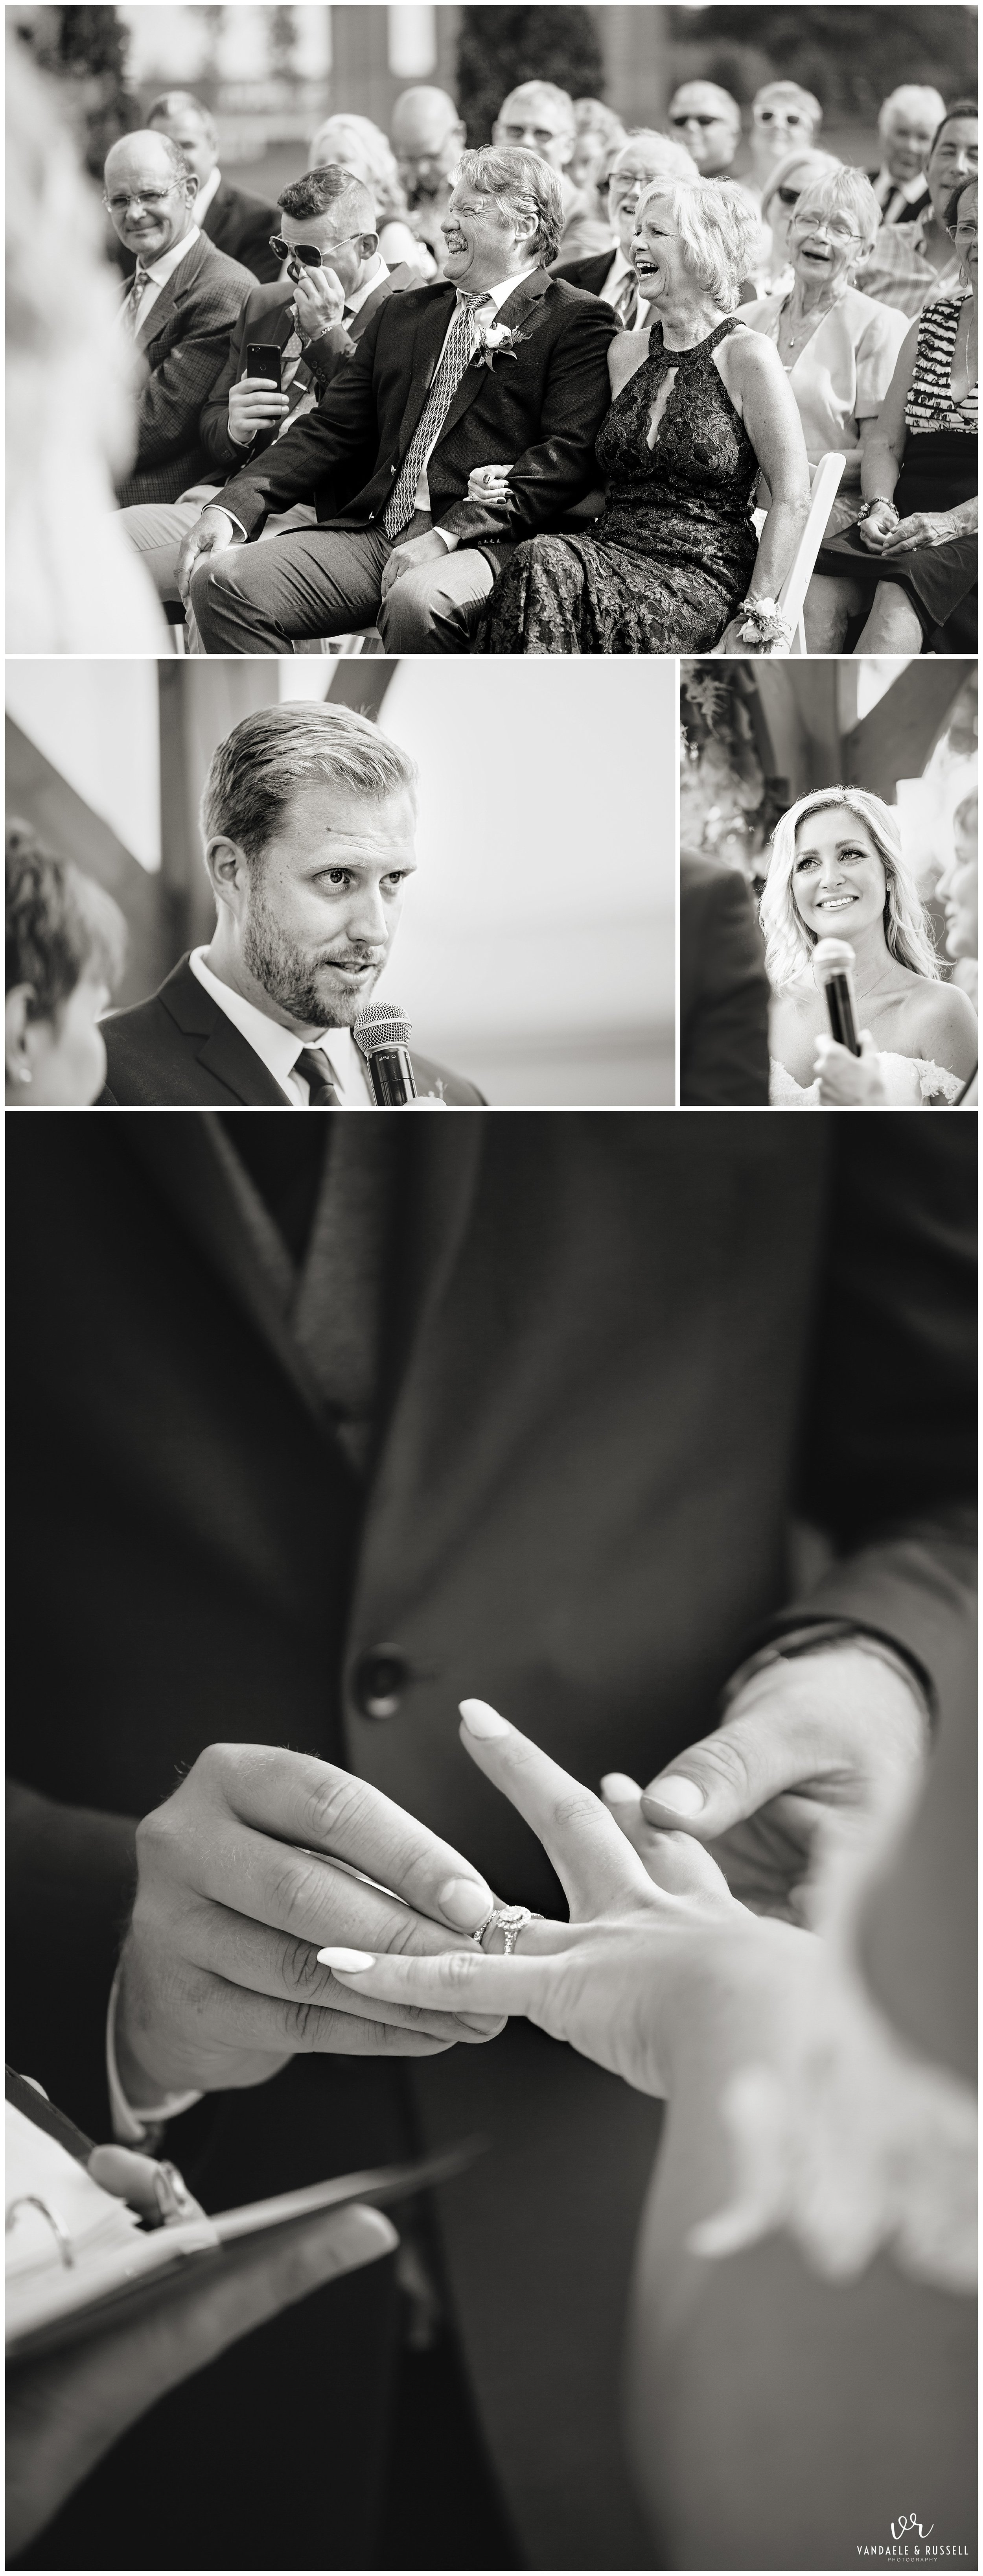 VanDaele-Russell-Wedding-Photography-London-Toronto-Ontario_0169.jpg